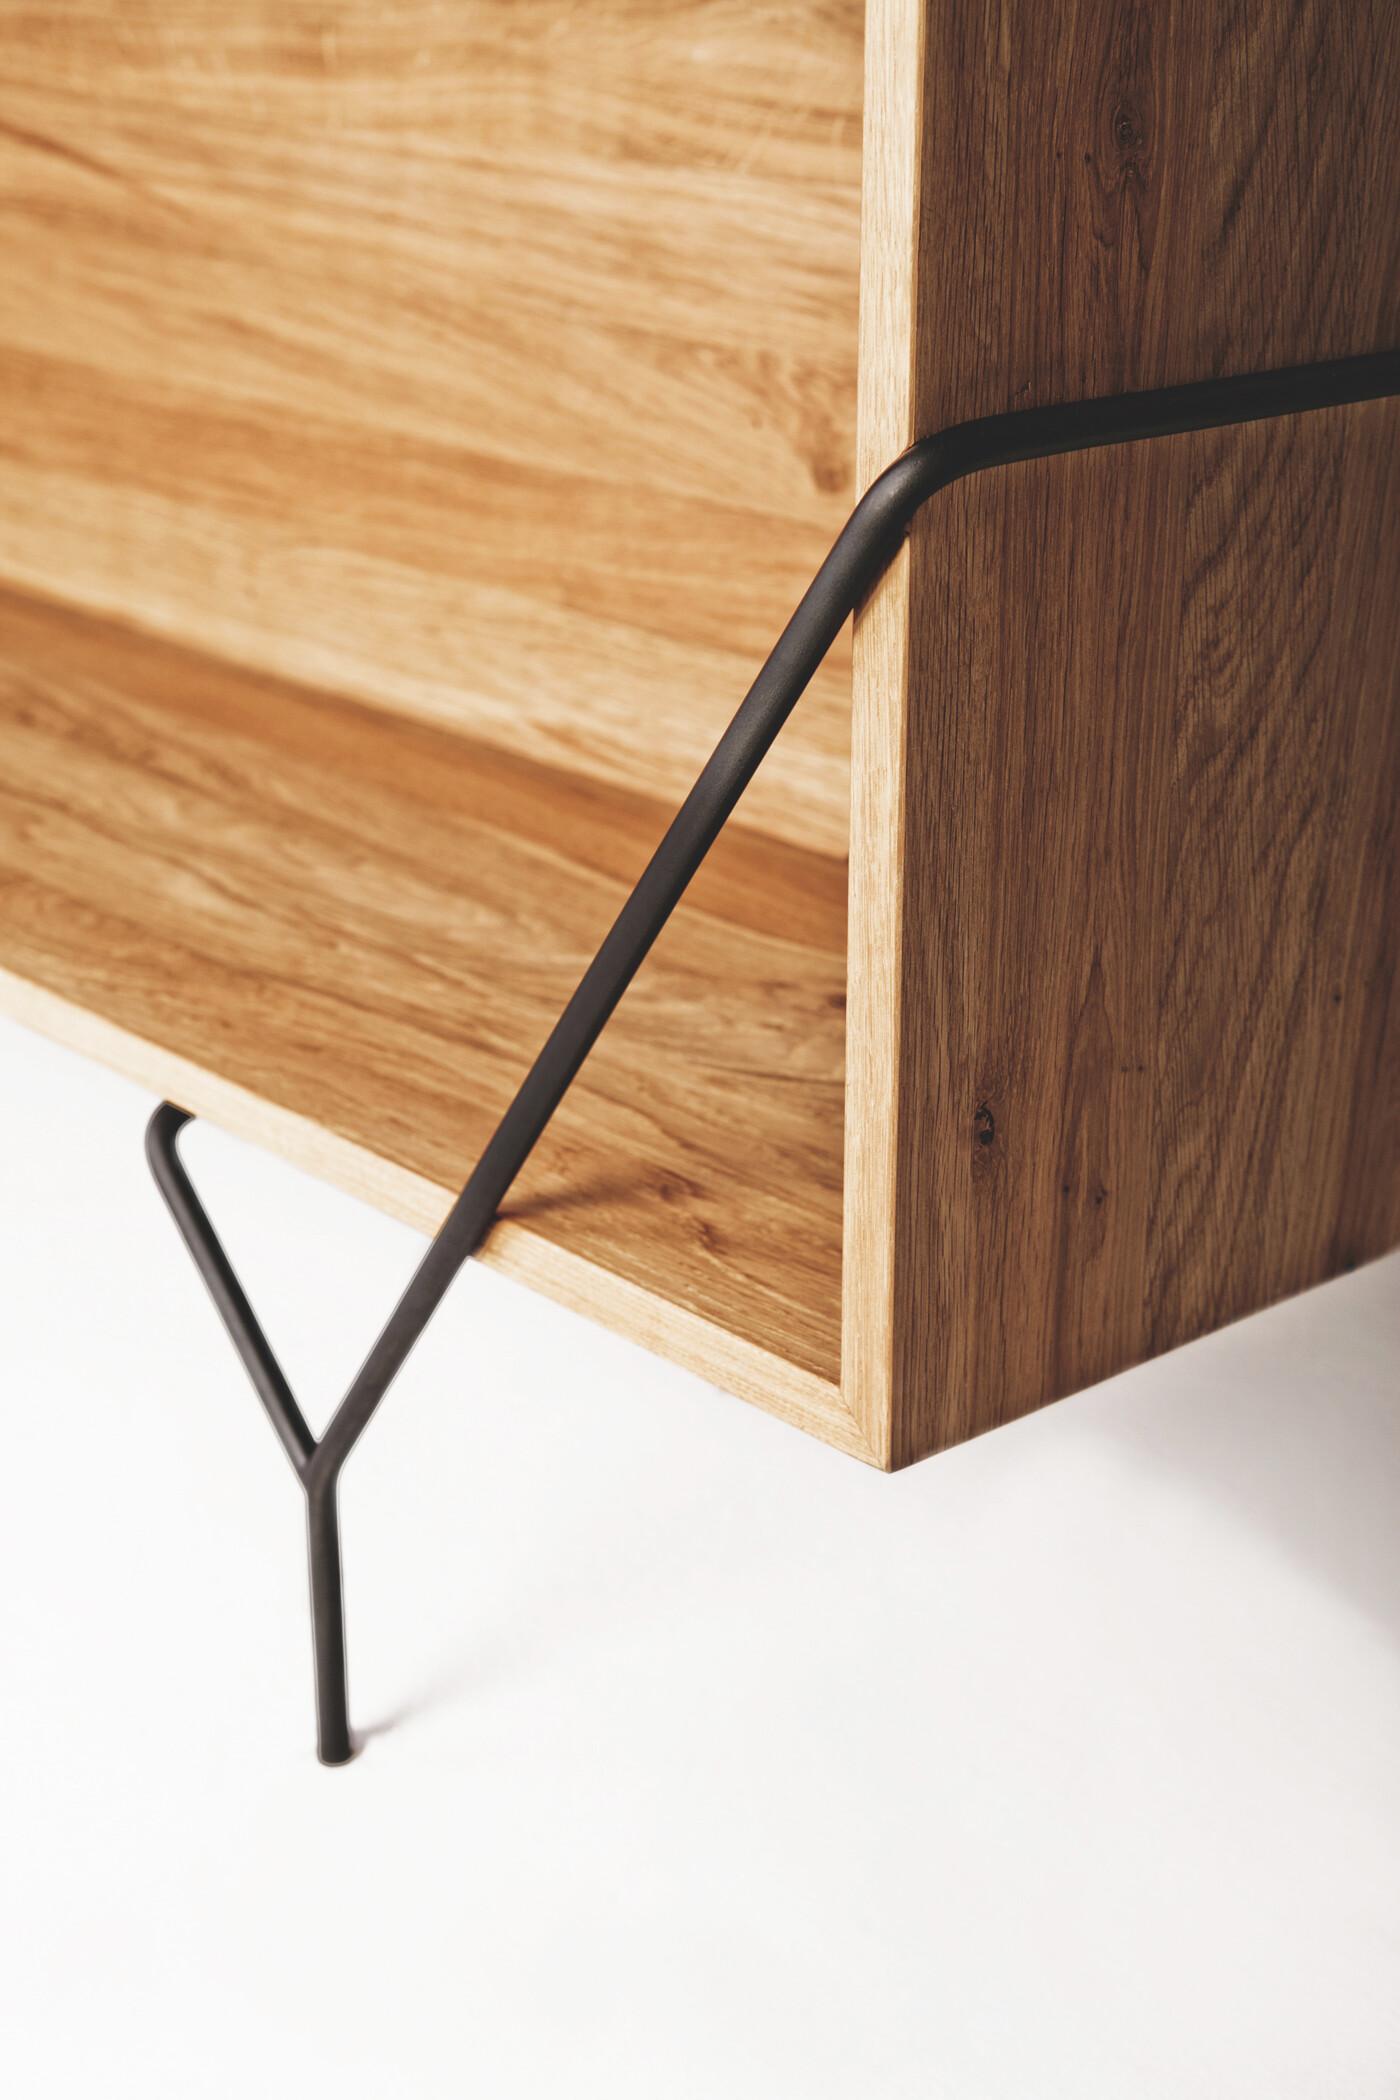 Collection by Kutarq Studio geometric shapes and metal-wood combination - HomeWorldDesign (4)